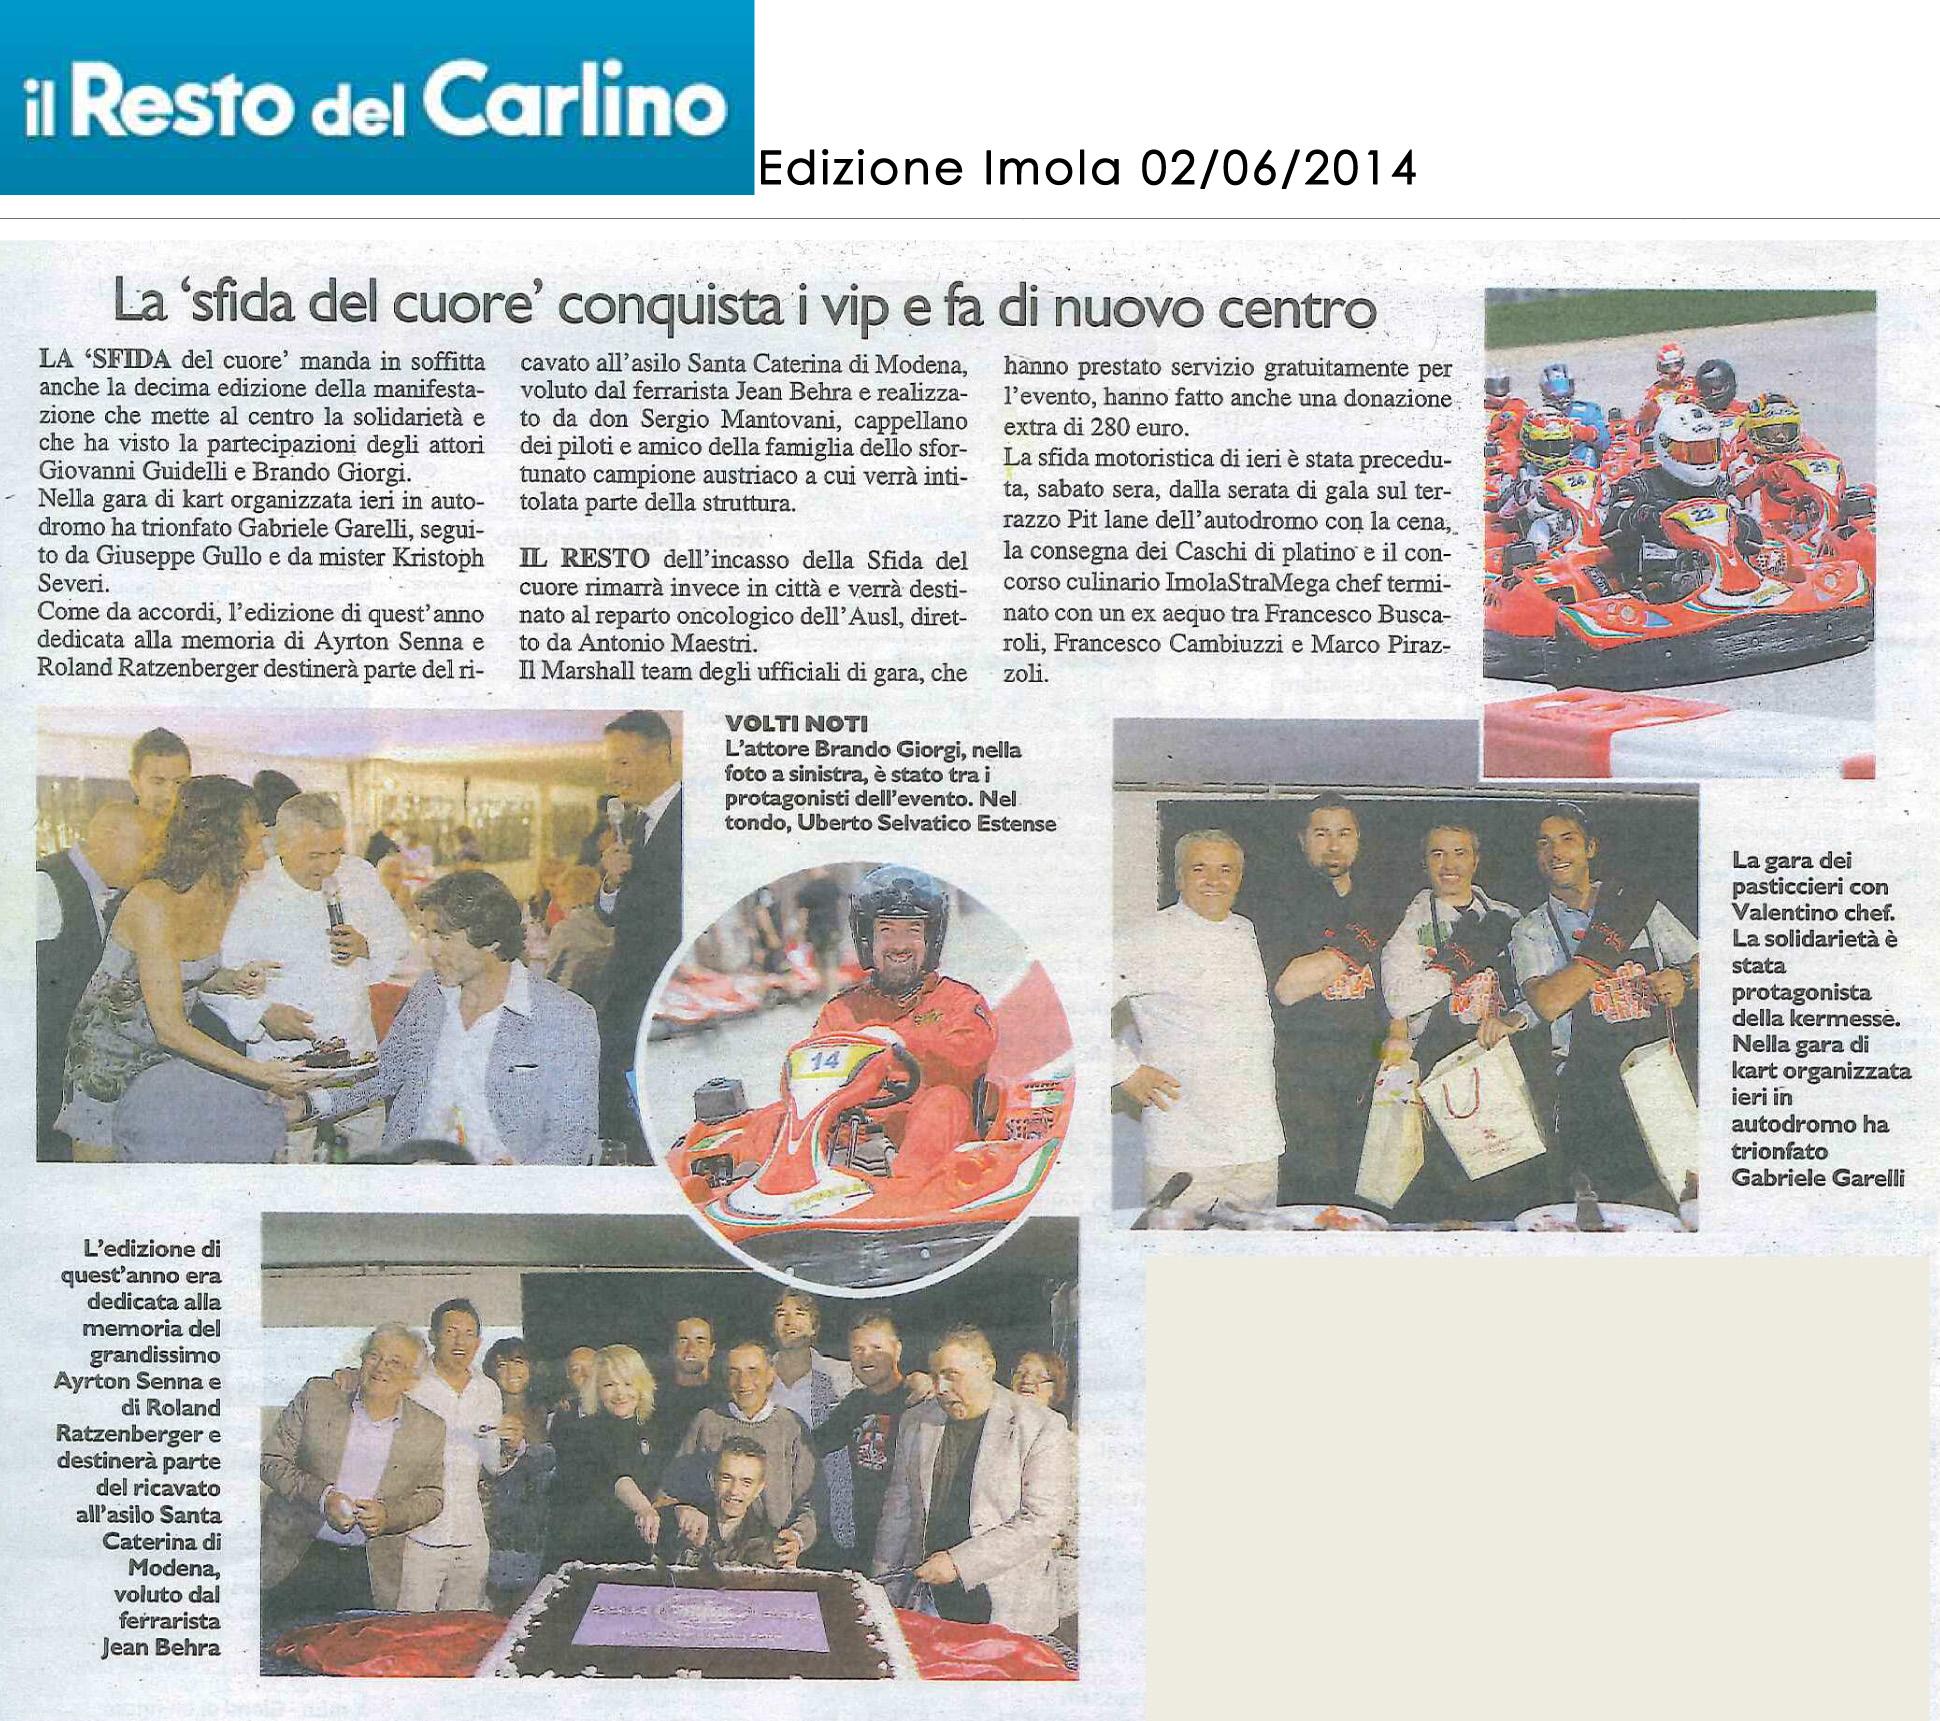 Carlino_02_06